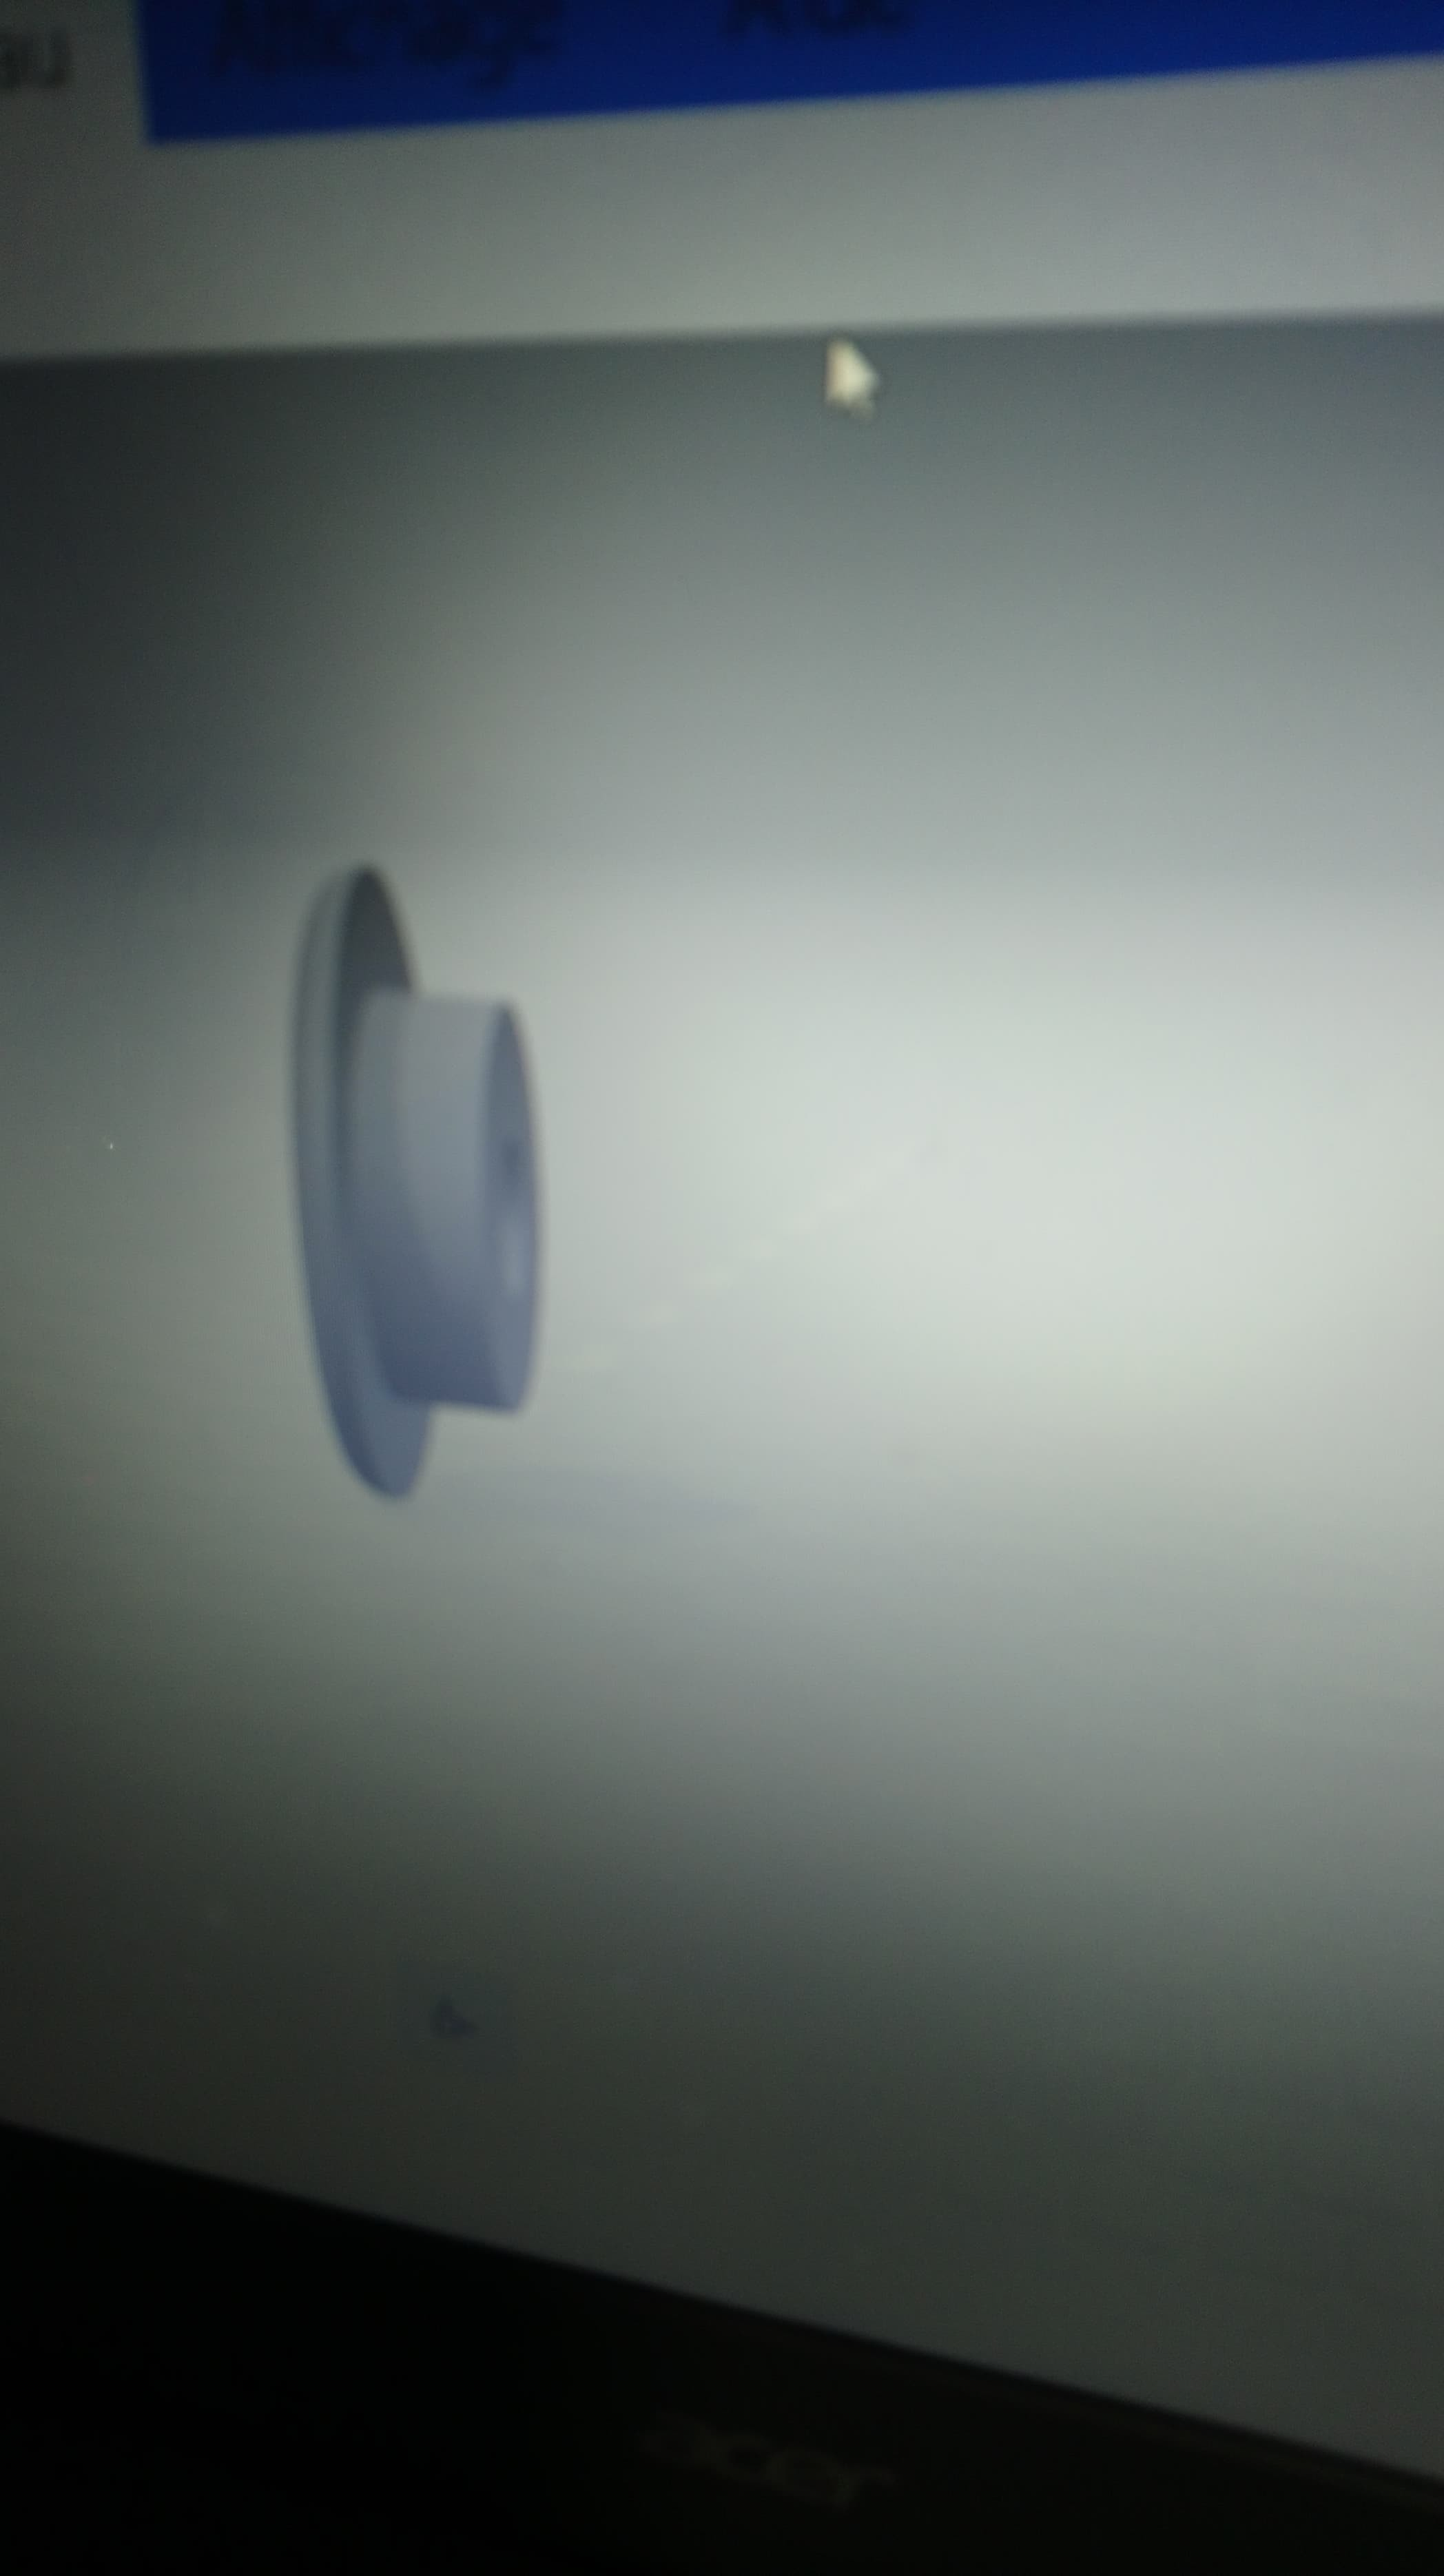 40284651_699282490413620_6248408380310814720_n.jpg Download STL file rubber silencer Suzuki sv 650 • 3D printing model, steph86160